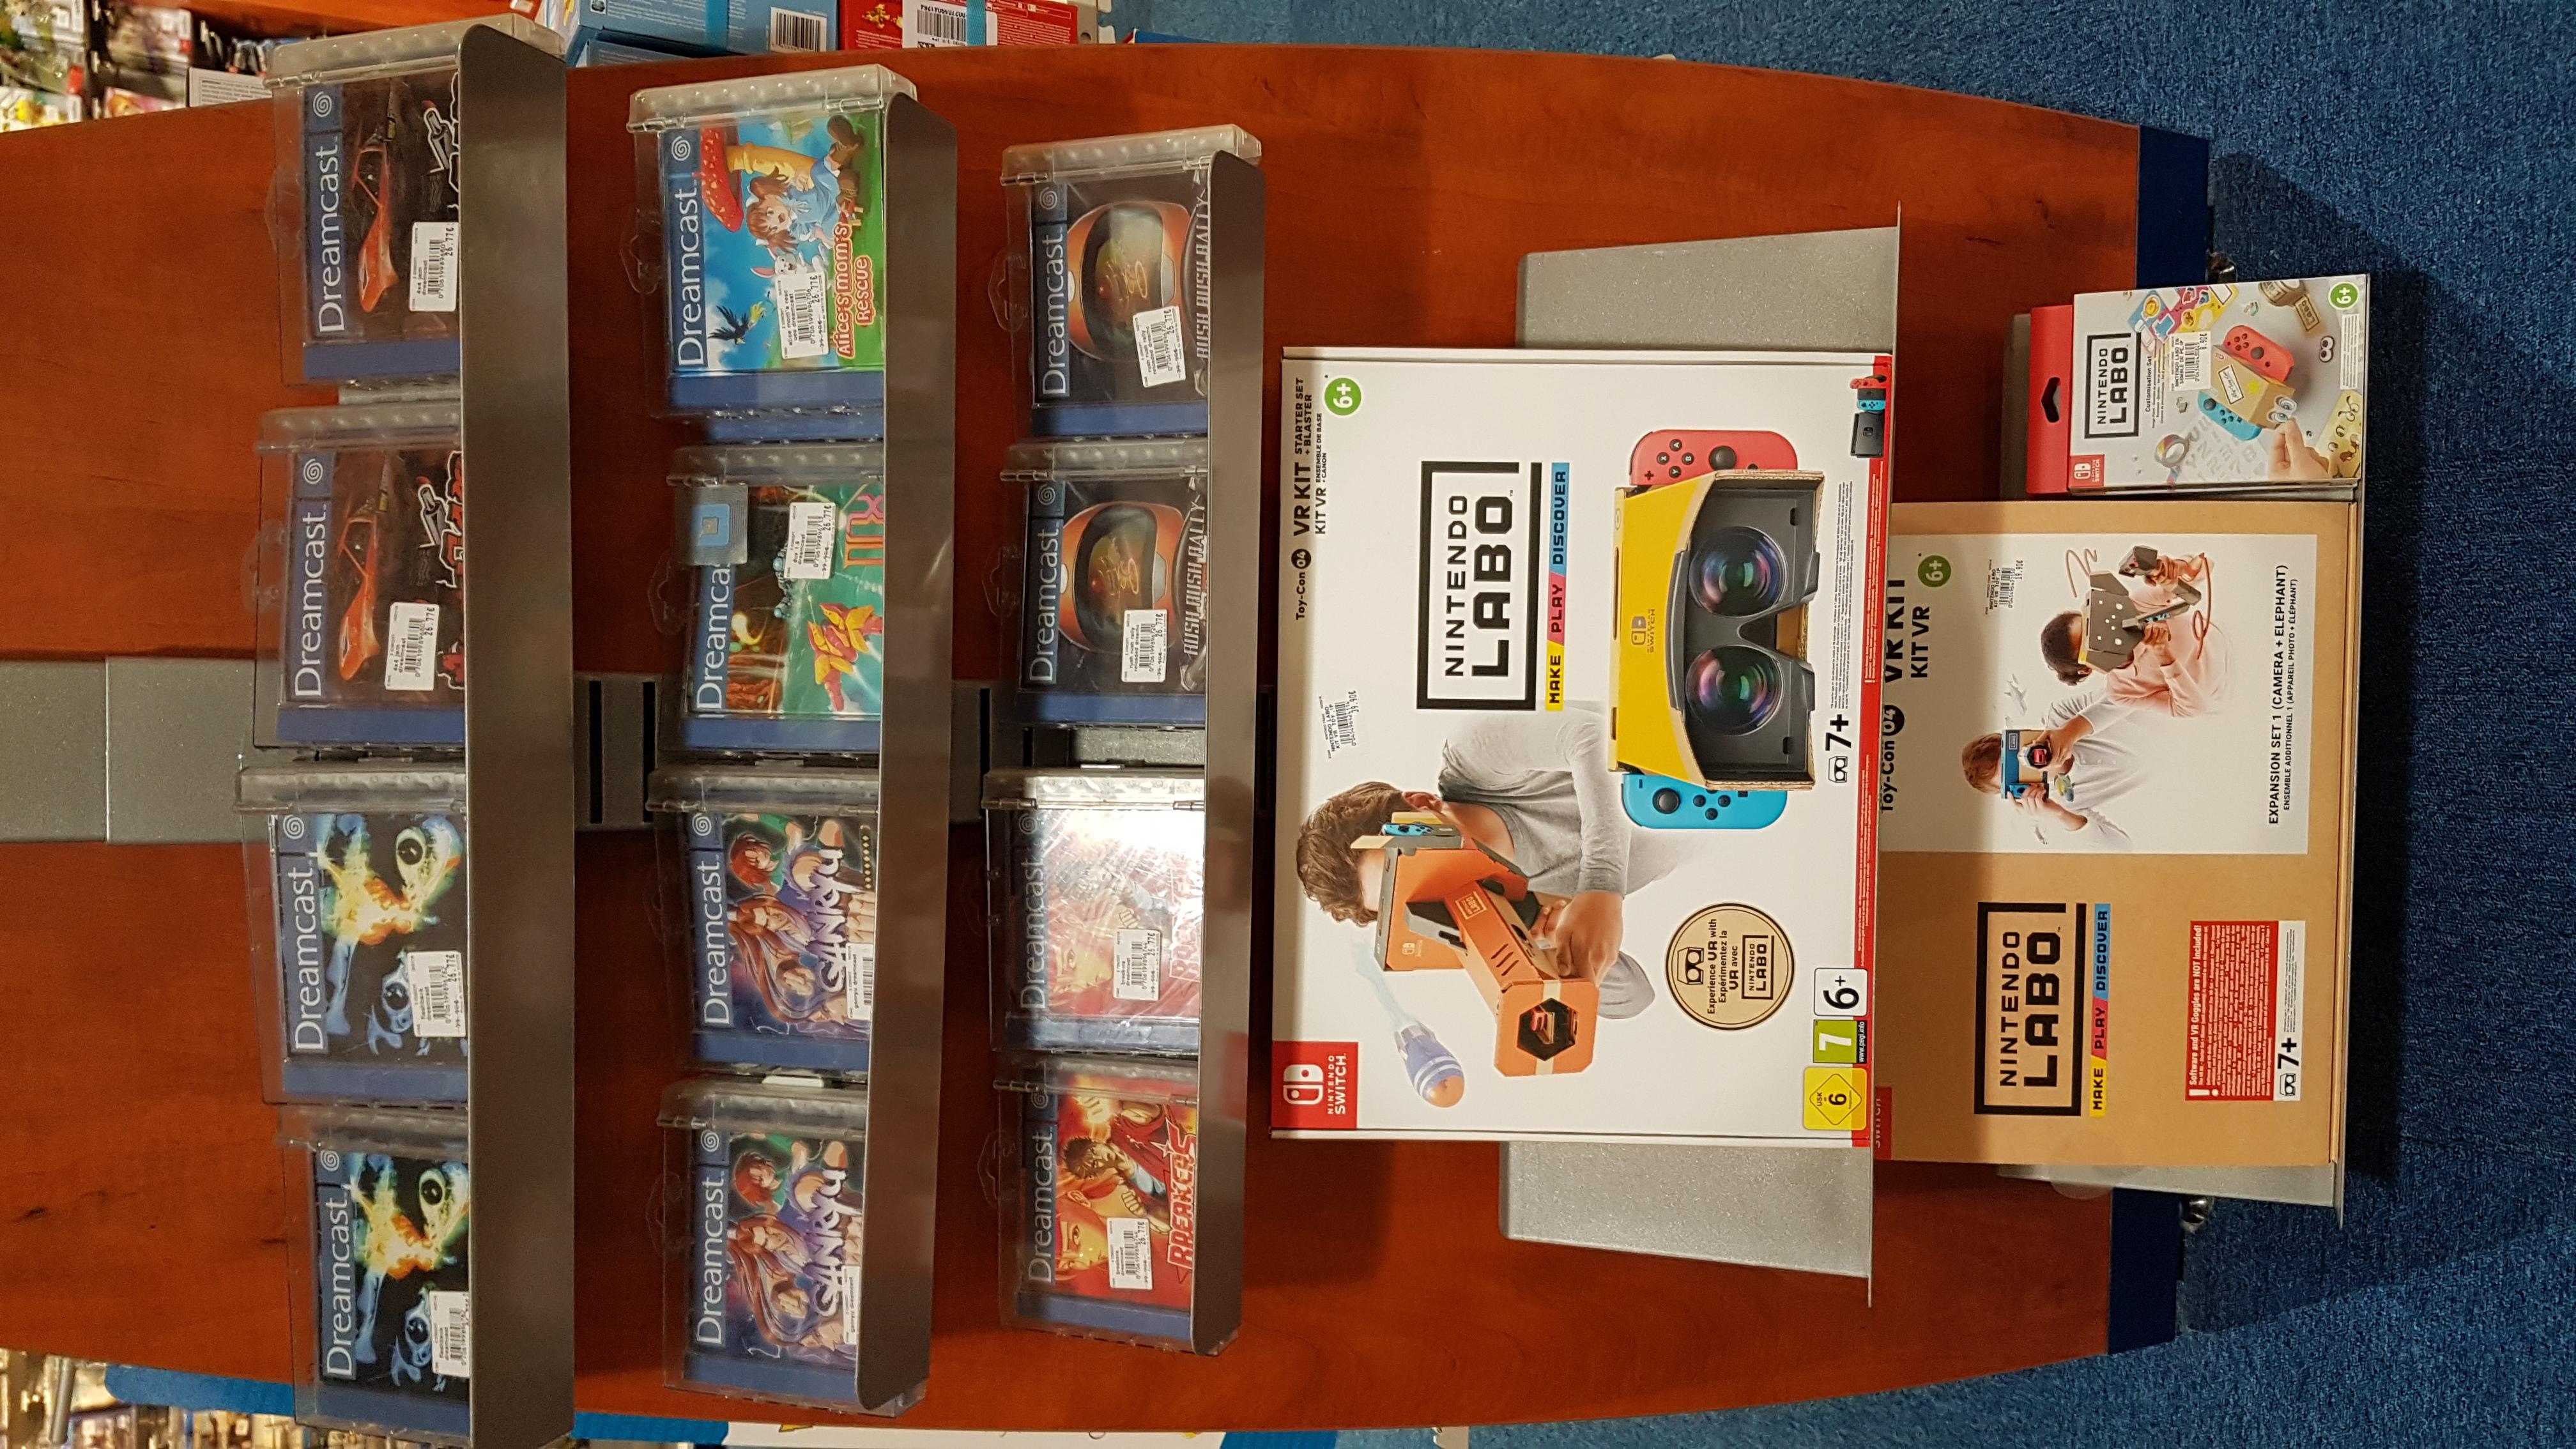 Jeux Dreamcast neuf à Leclerc o_O 1559653537-20190604-145416